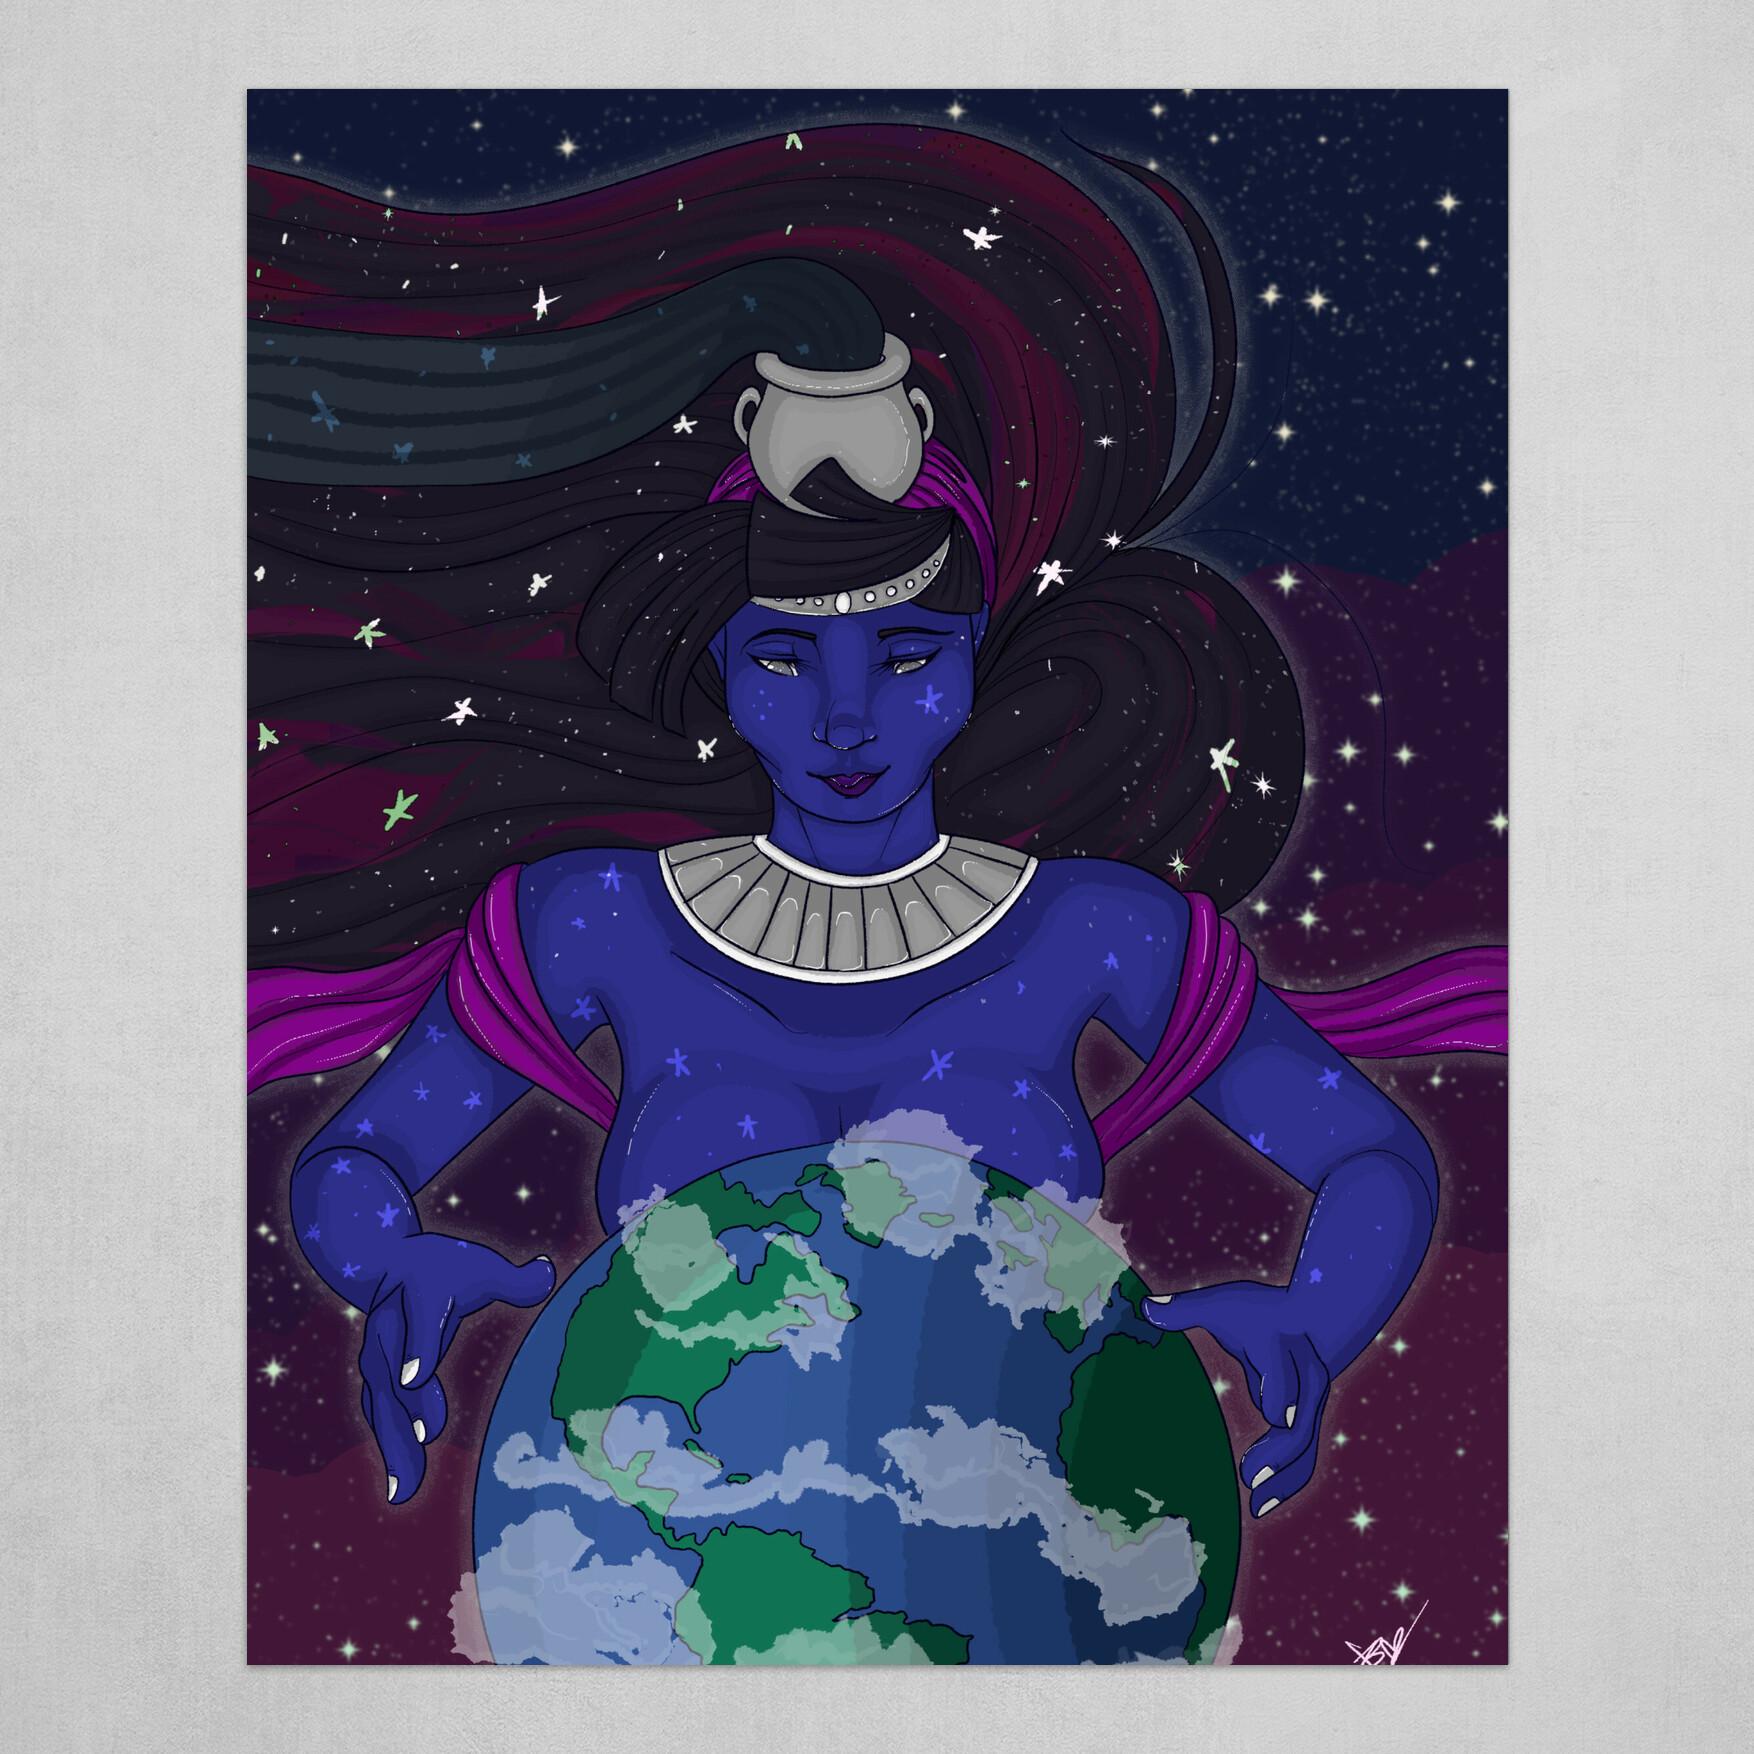 Mistress of the Heavens